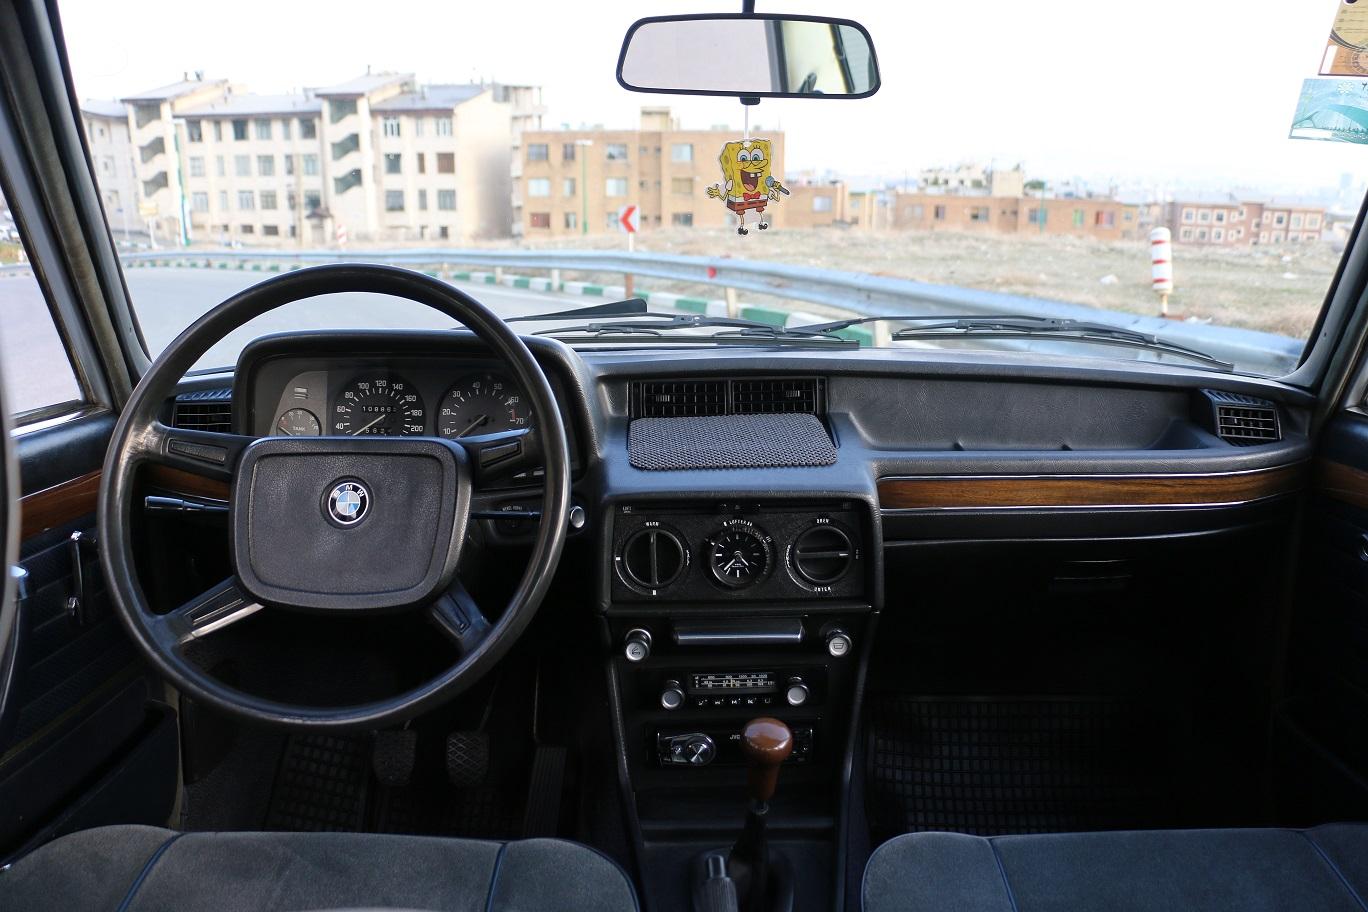 File:BMW E12 Interior.jpg - Wikimedia Commons